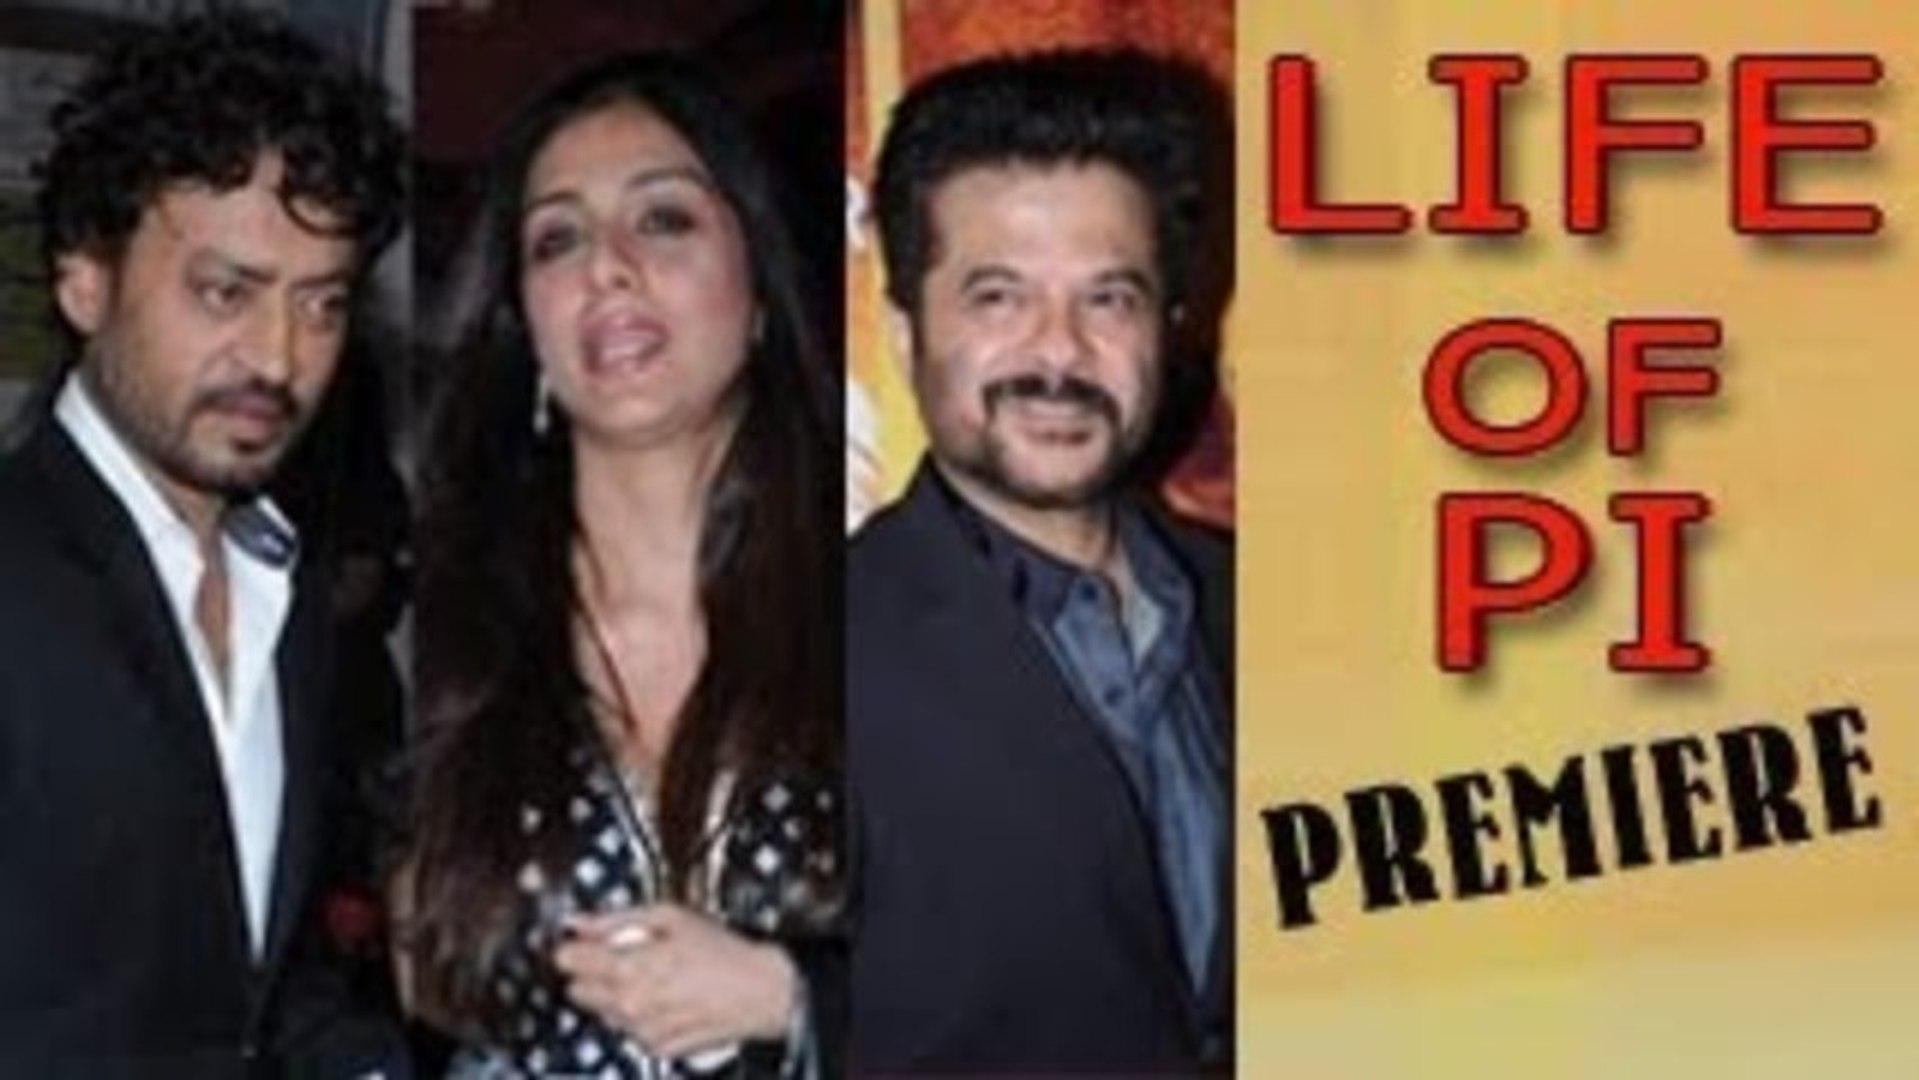 Life of Pi India Premiere - Irrfan Khan, Tabu & Anil Kapoor